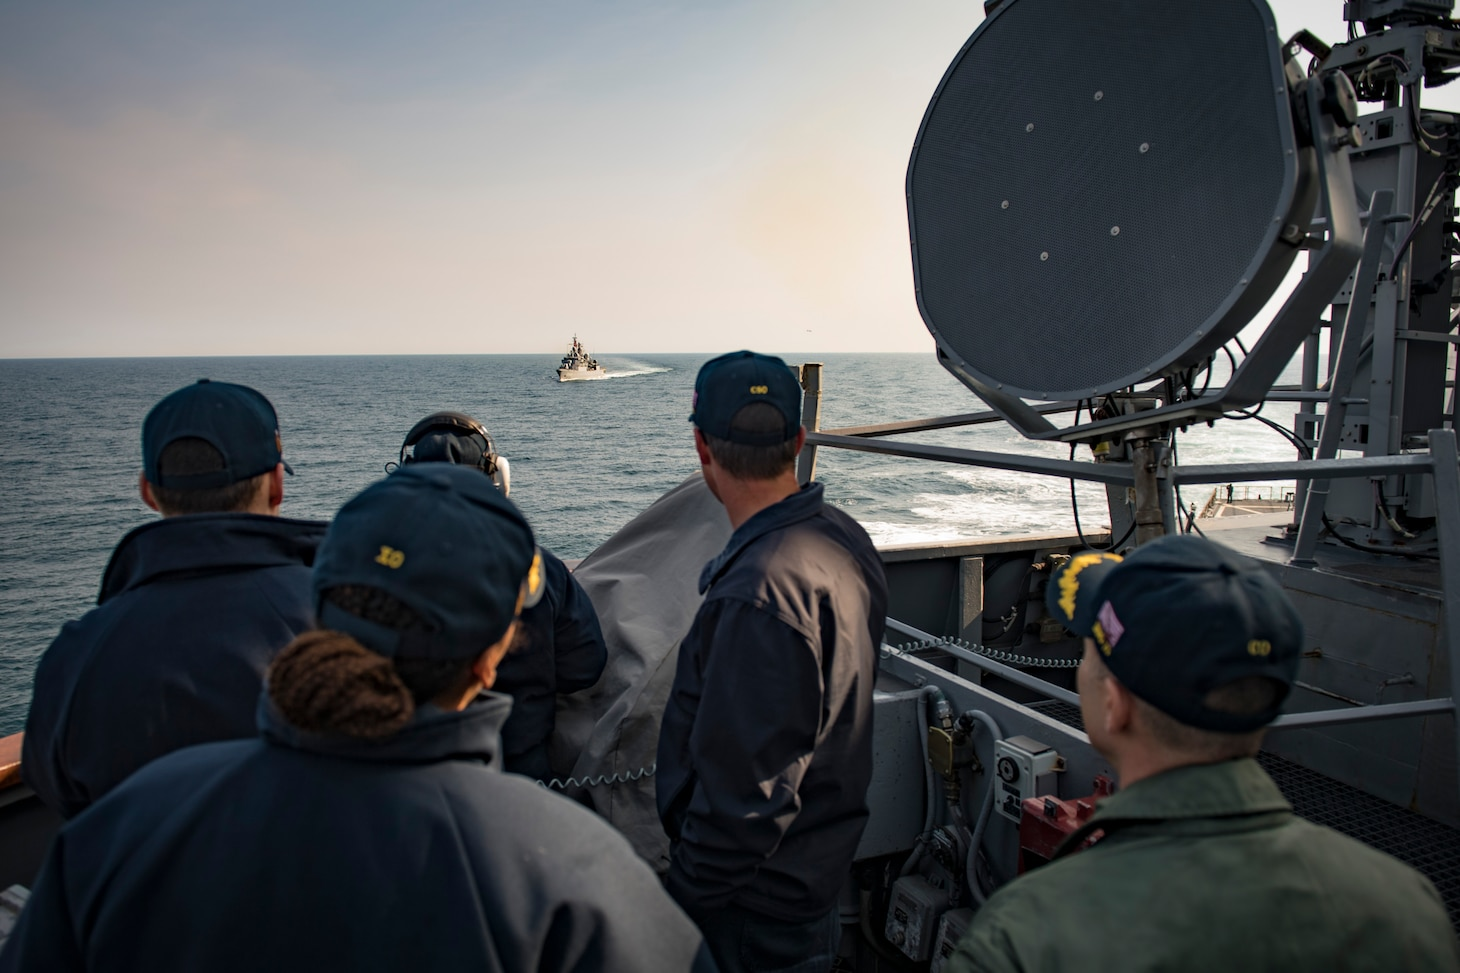 Maritime Training with Turkey in Black Sea